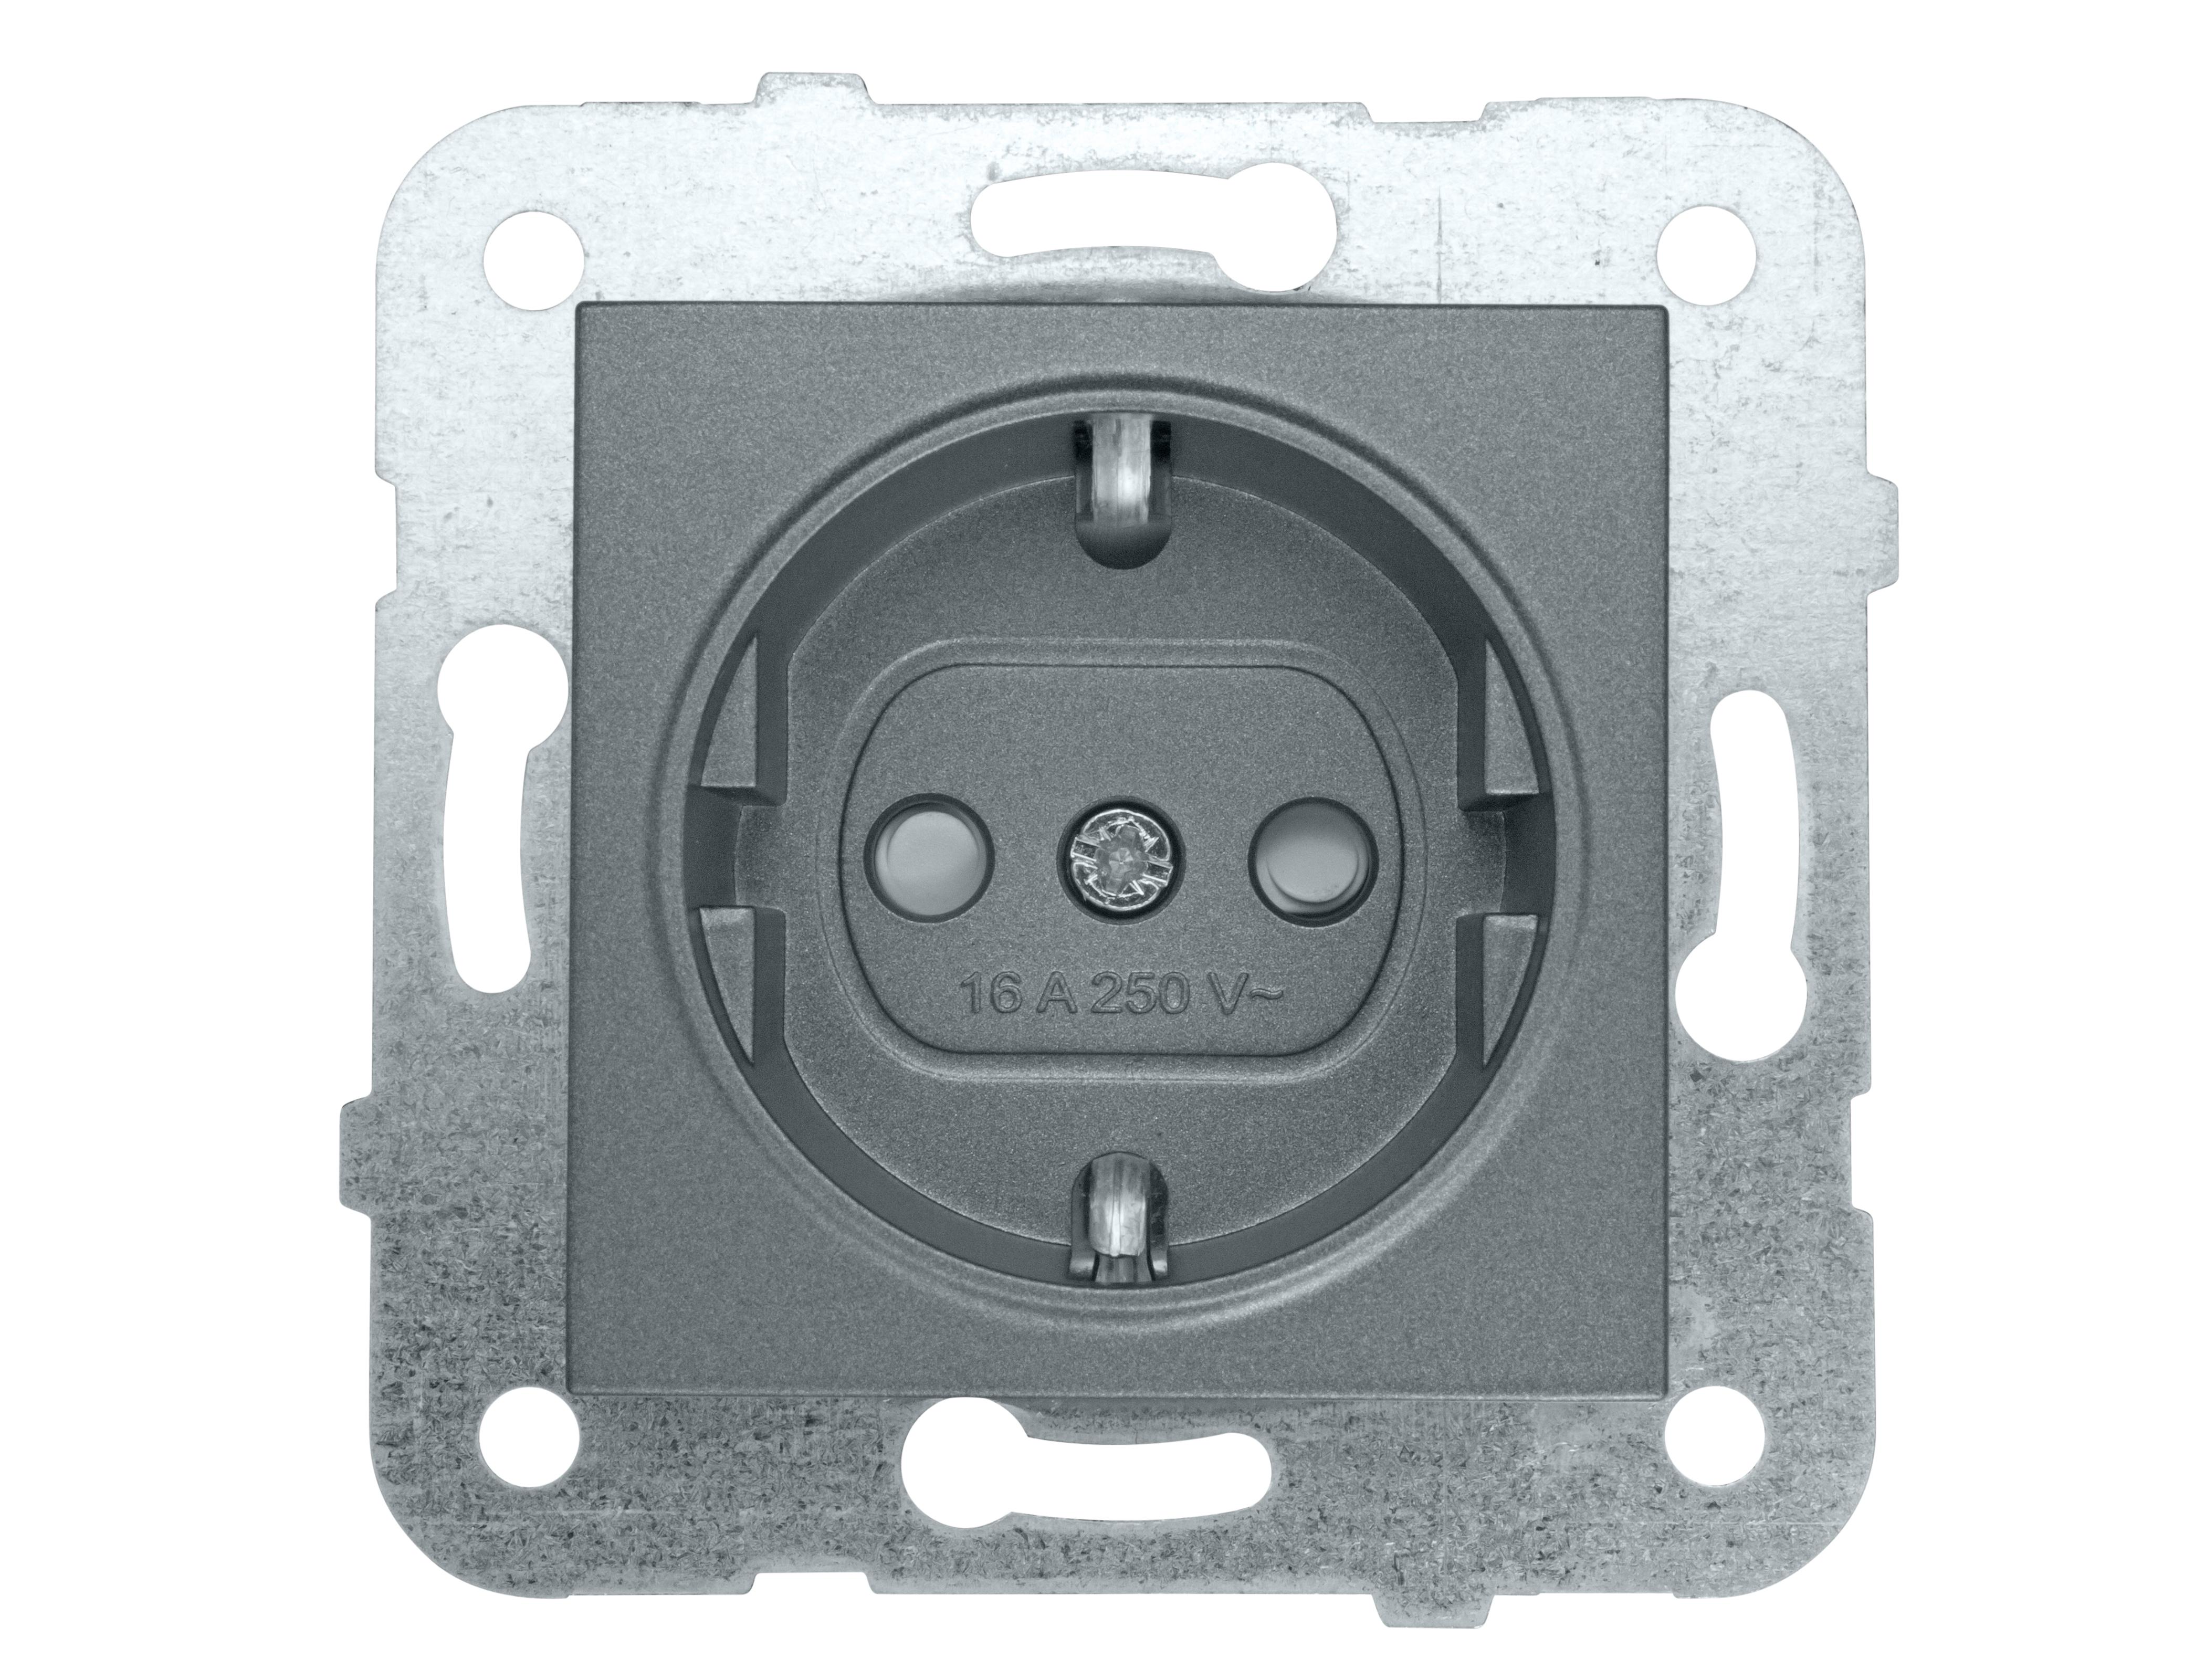 1 Stk Steckdose, erhöhter Berührungsschutz, anthrazit, Steckklemme EV111003--